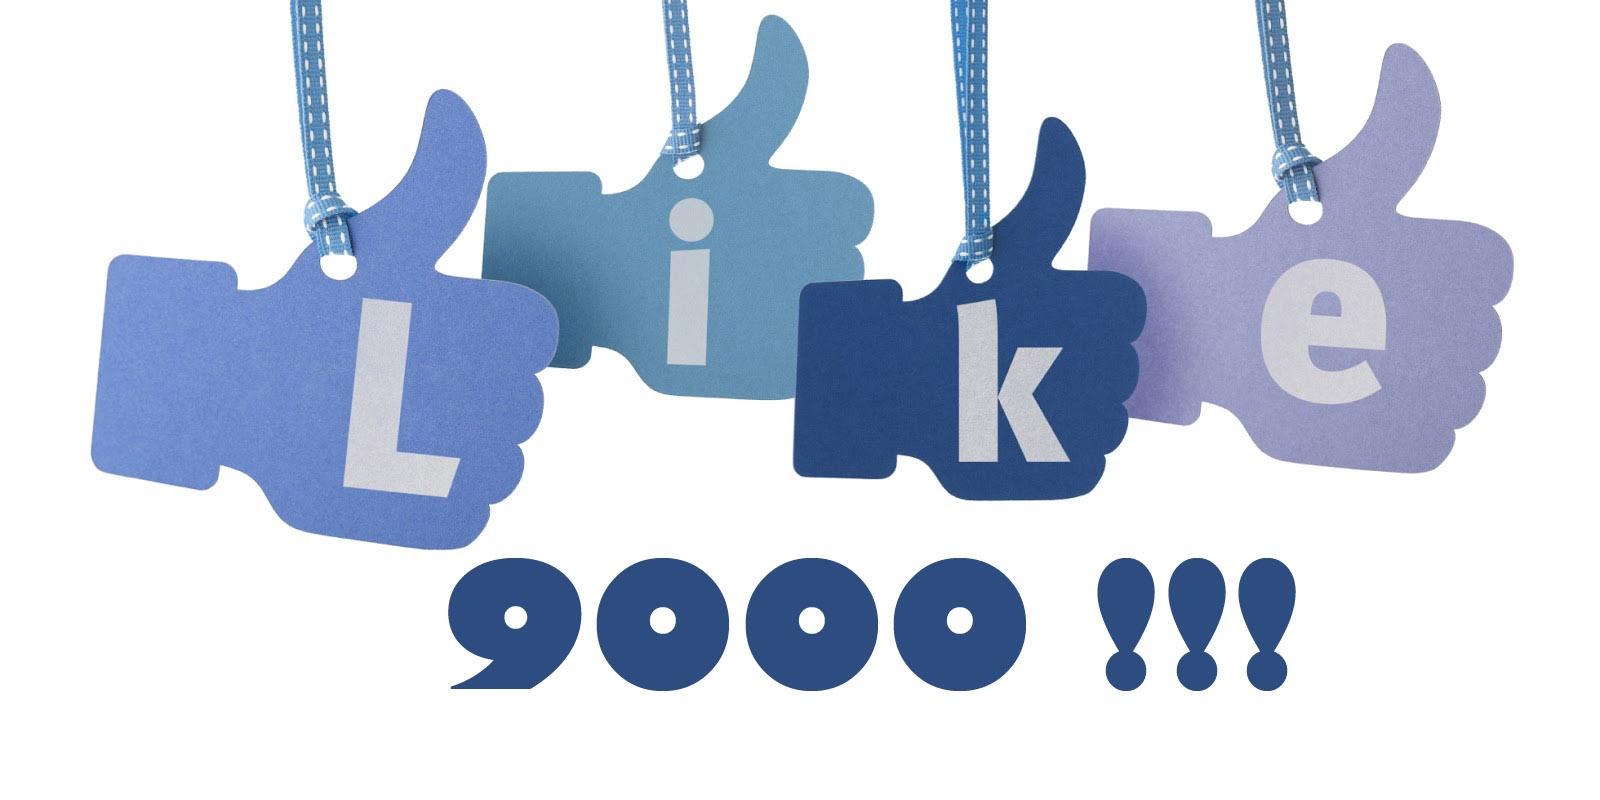 9000 (number)